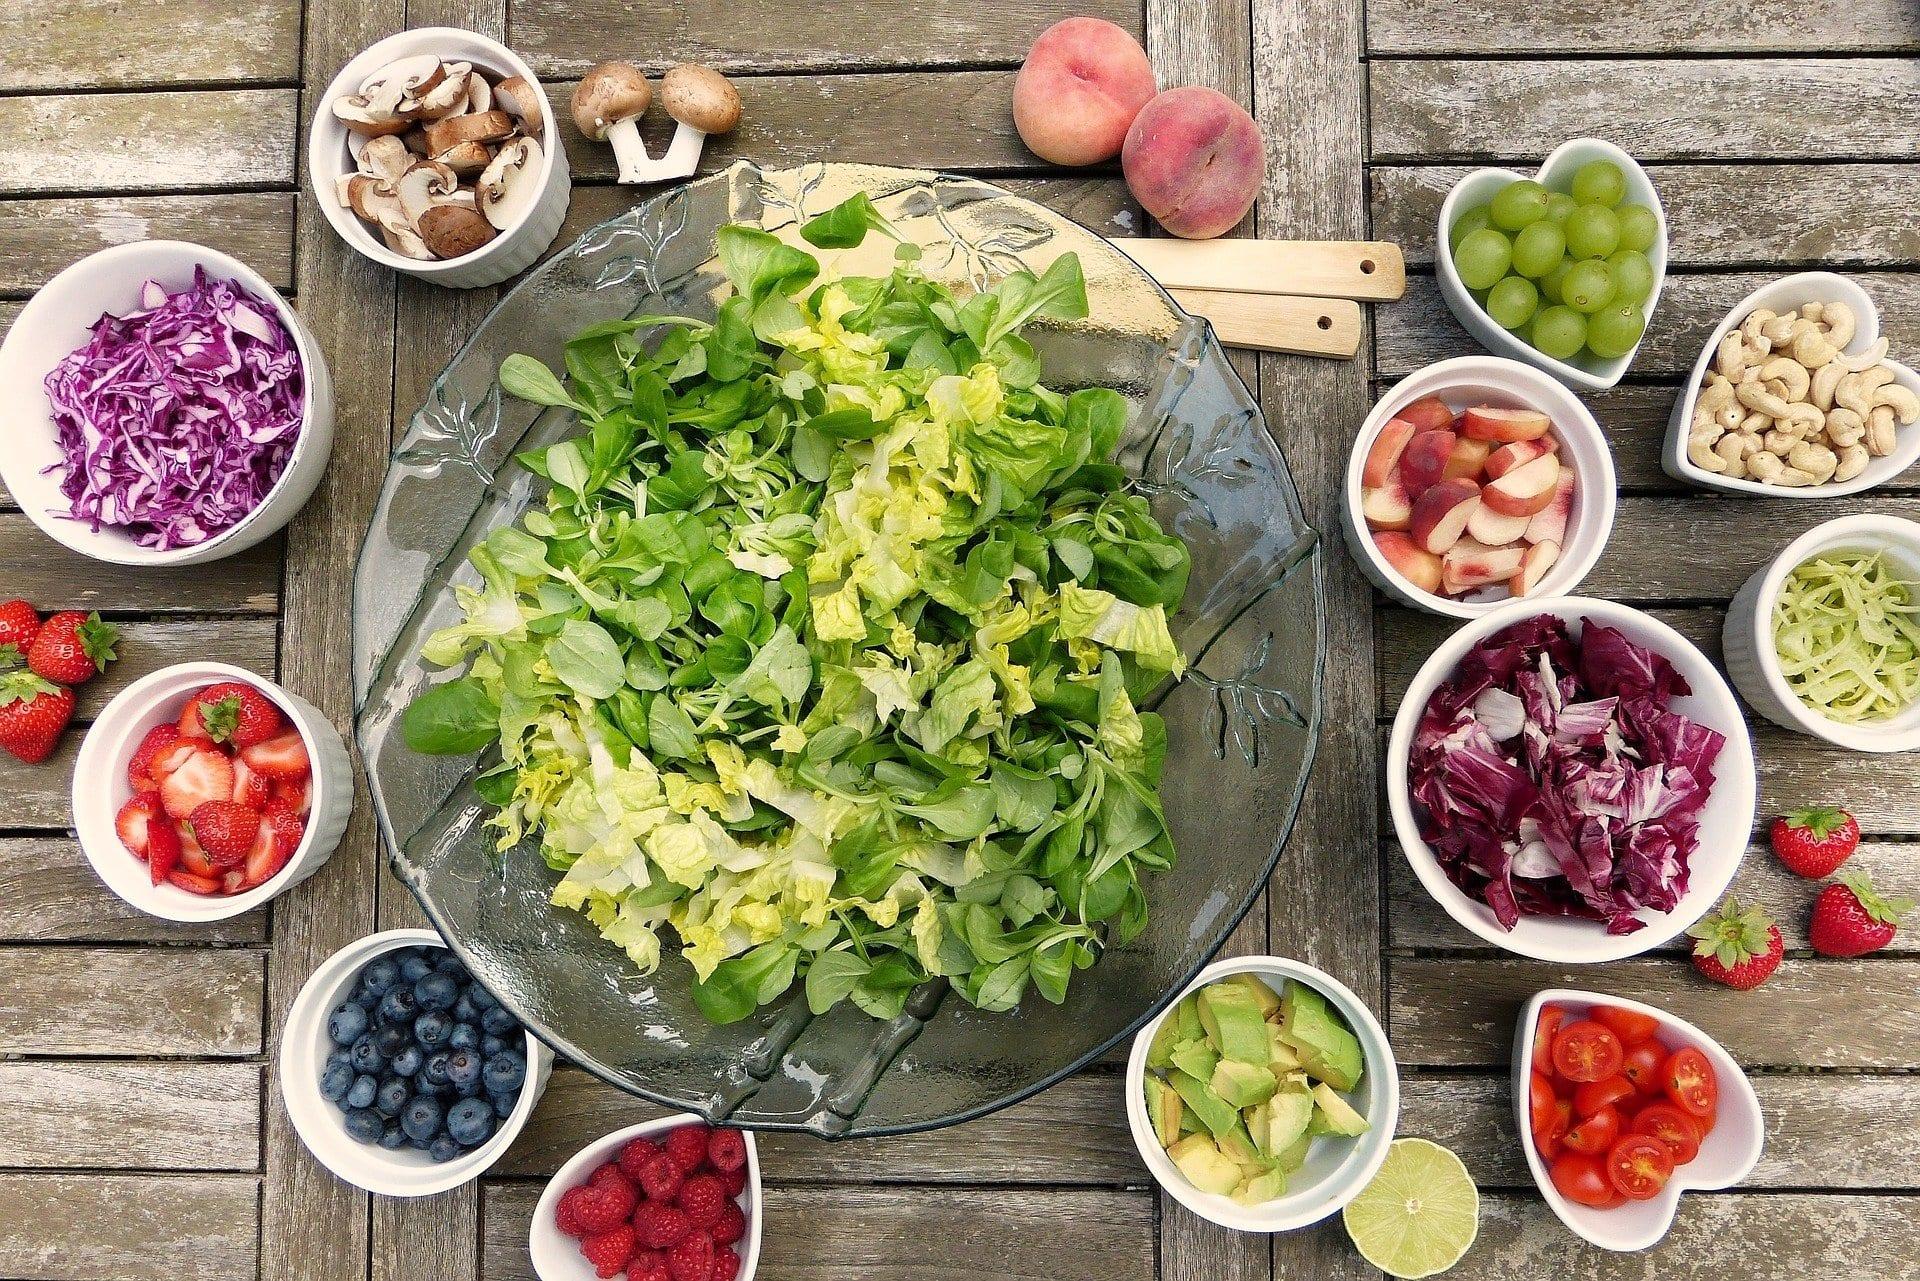 salad, good eating habits